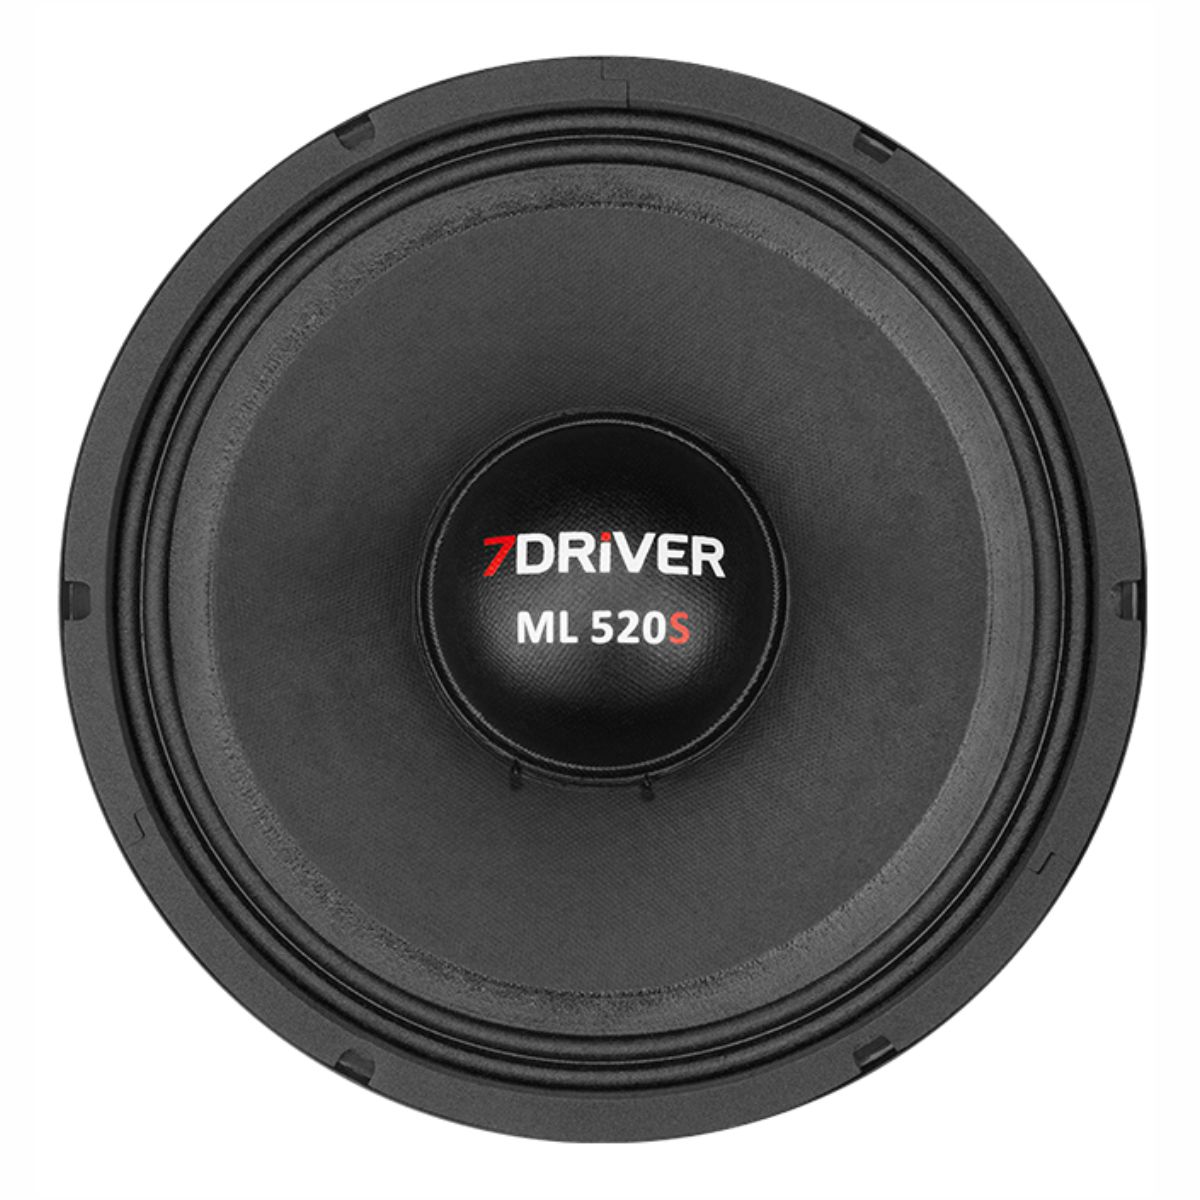 "Alto Falante Woofer 7Driver 10"" ML 520S 520W Rms 4 Ohms"